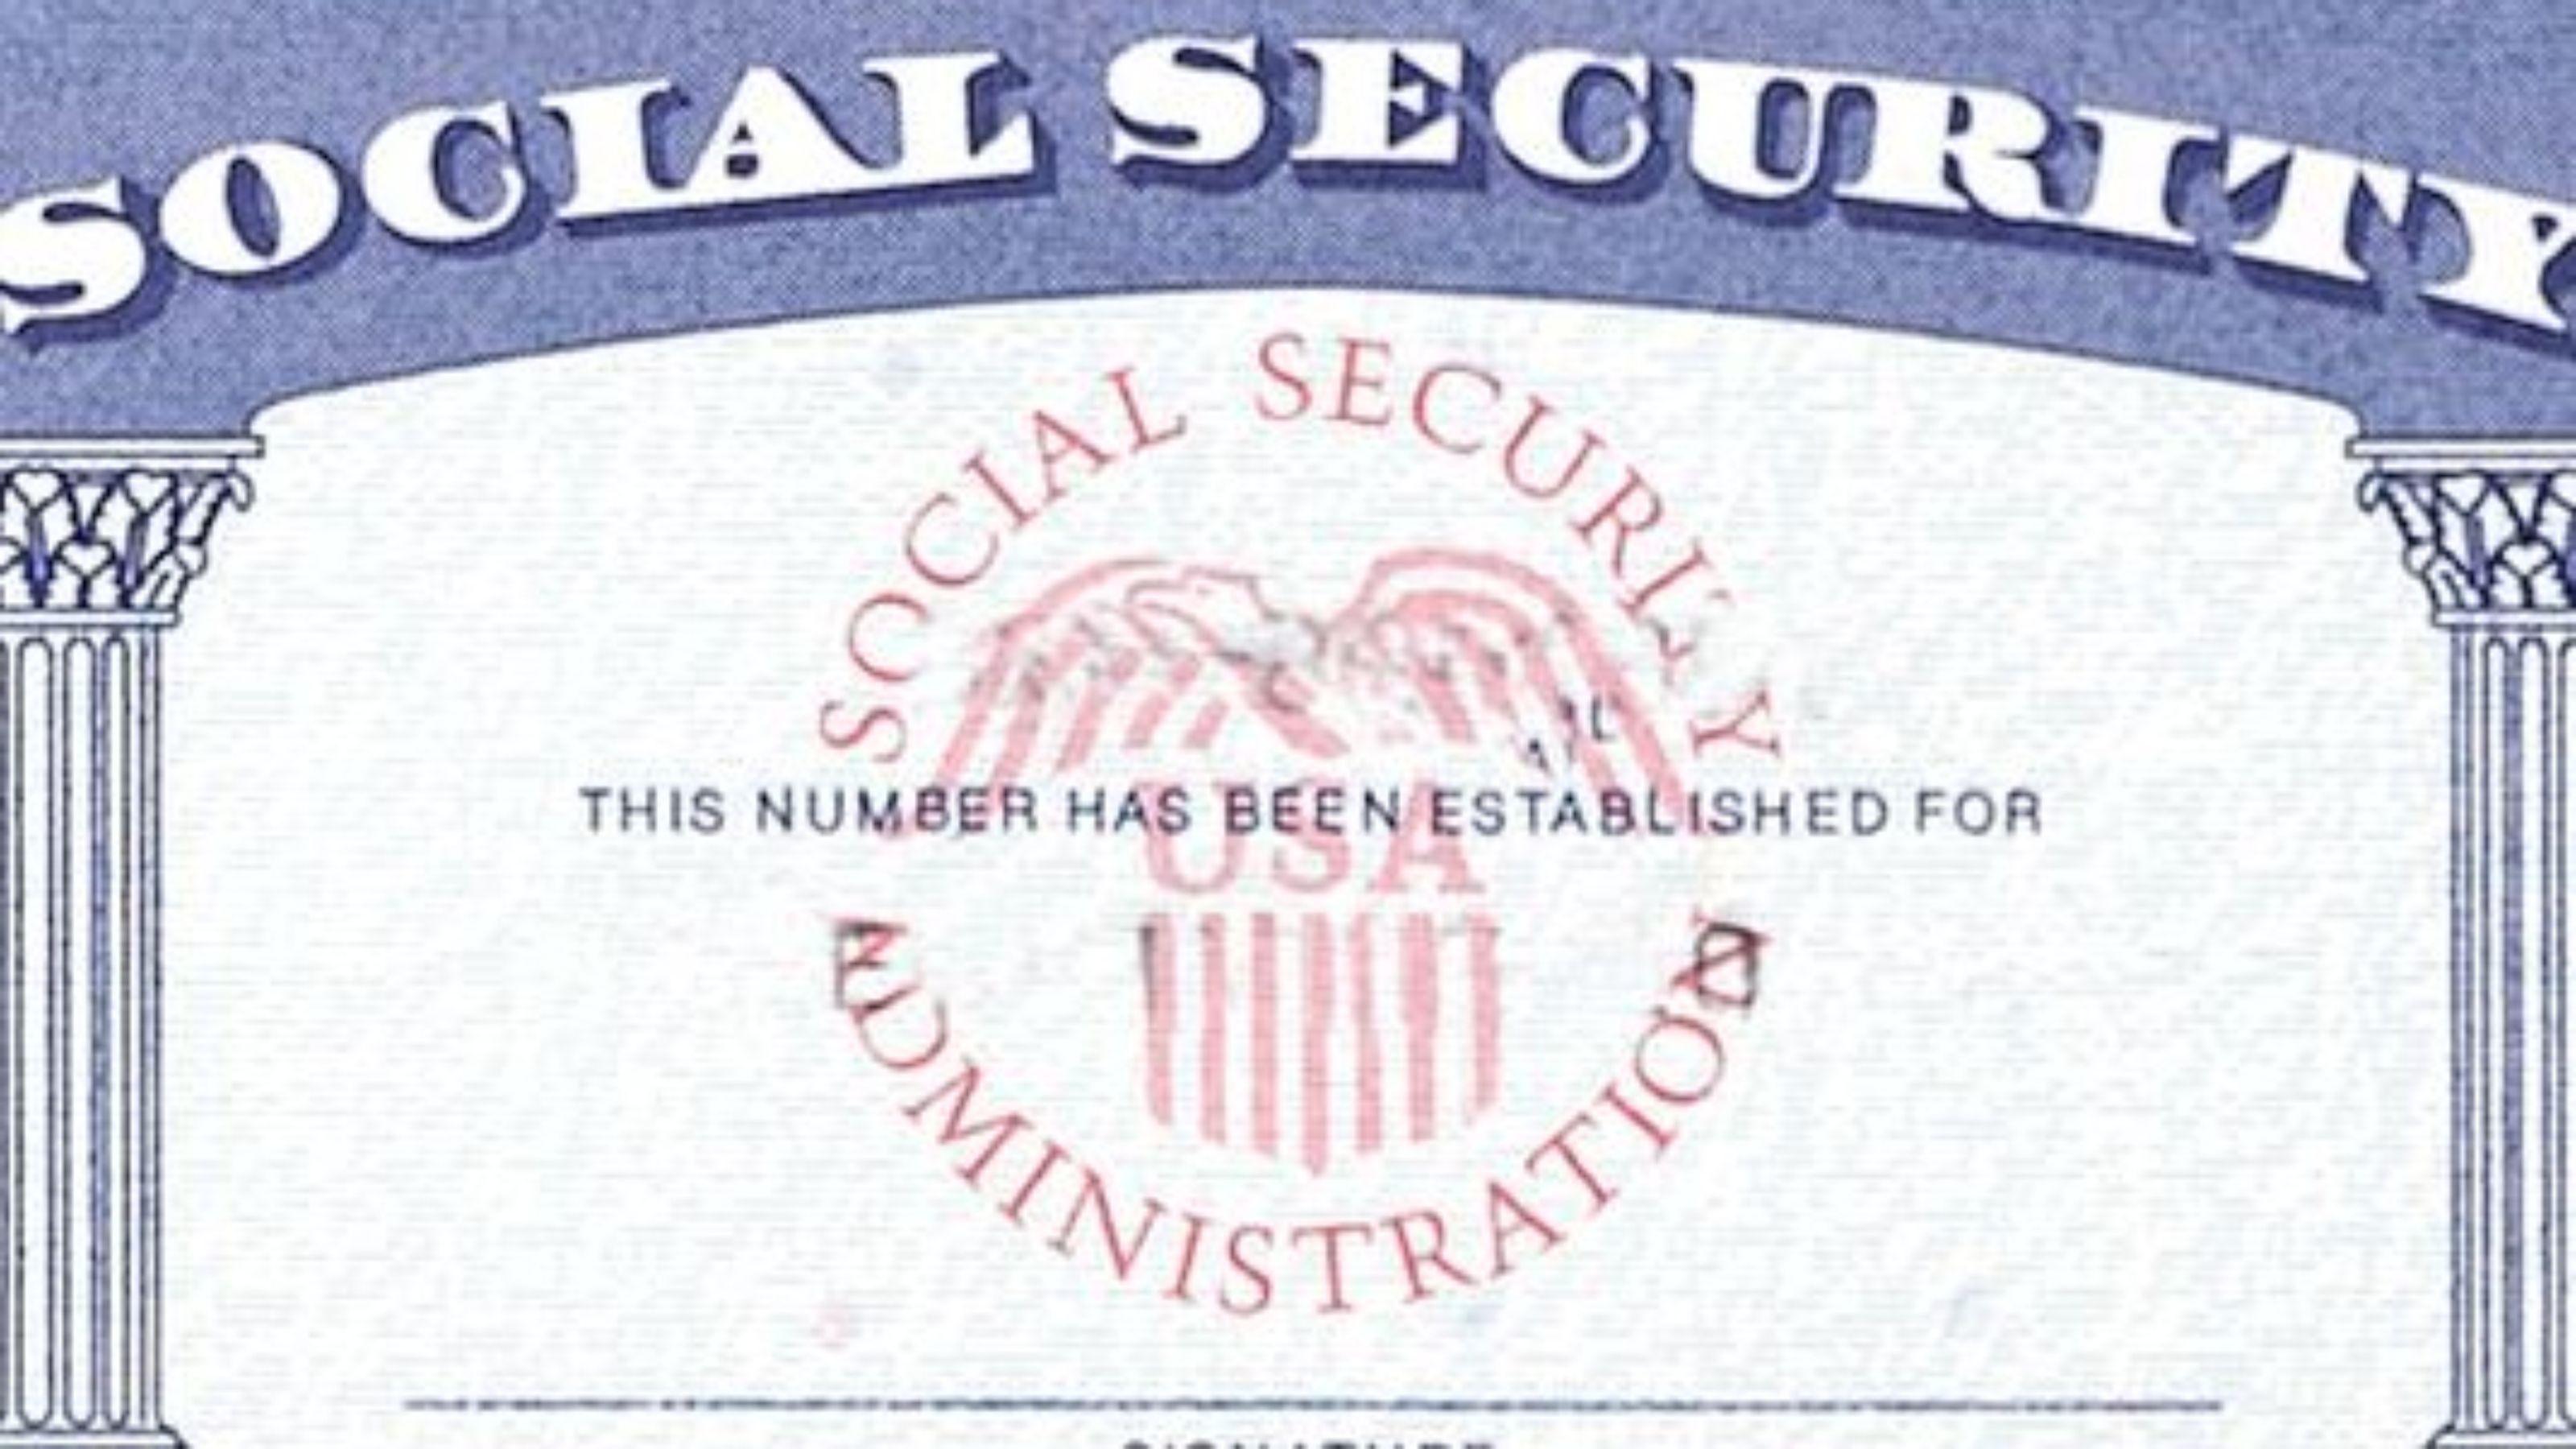 Social Security Card Template Psd - Atlantaauctionco Intended For Social Security Card Template Photoshop